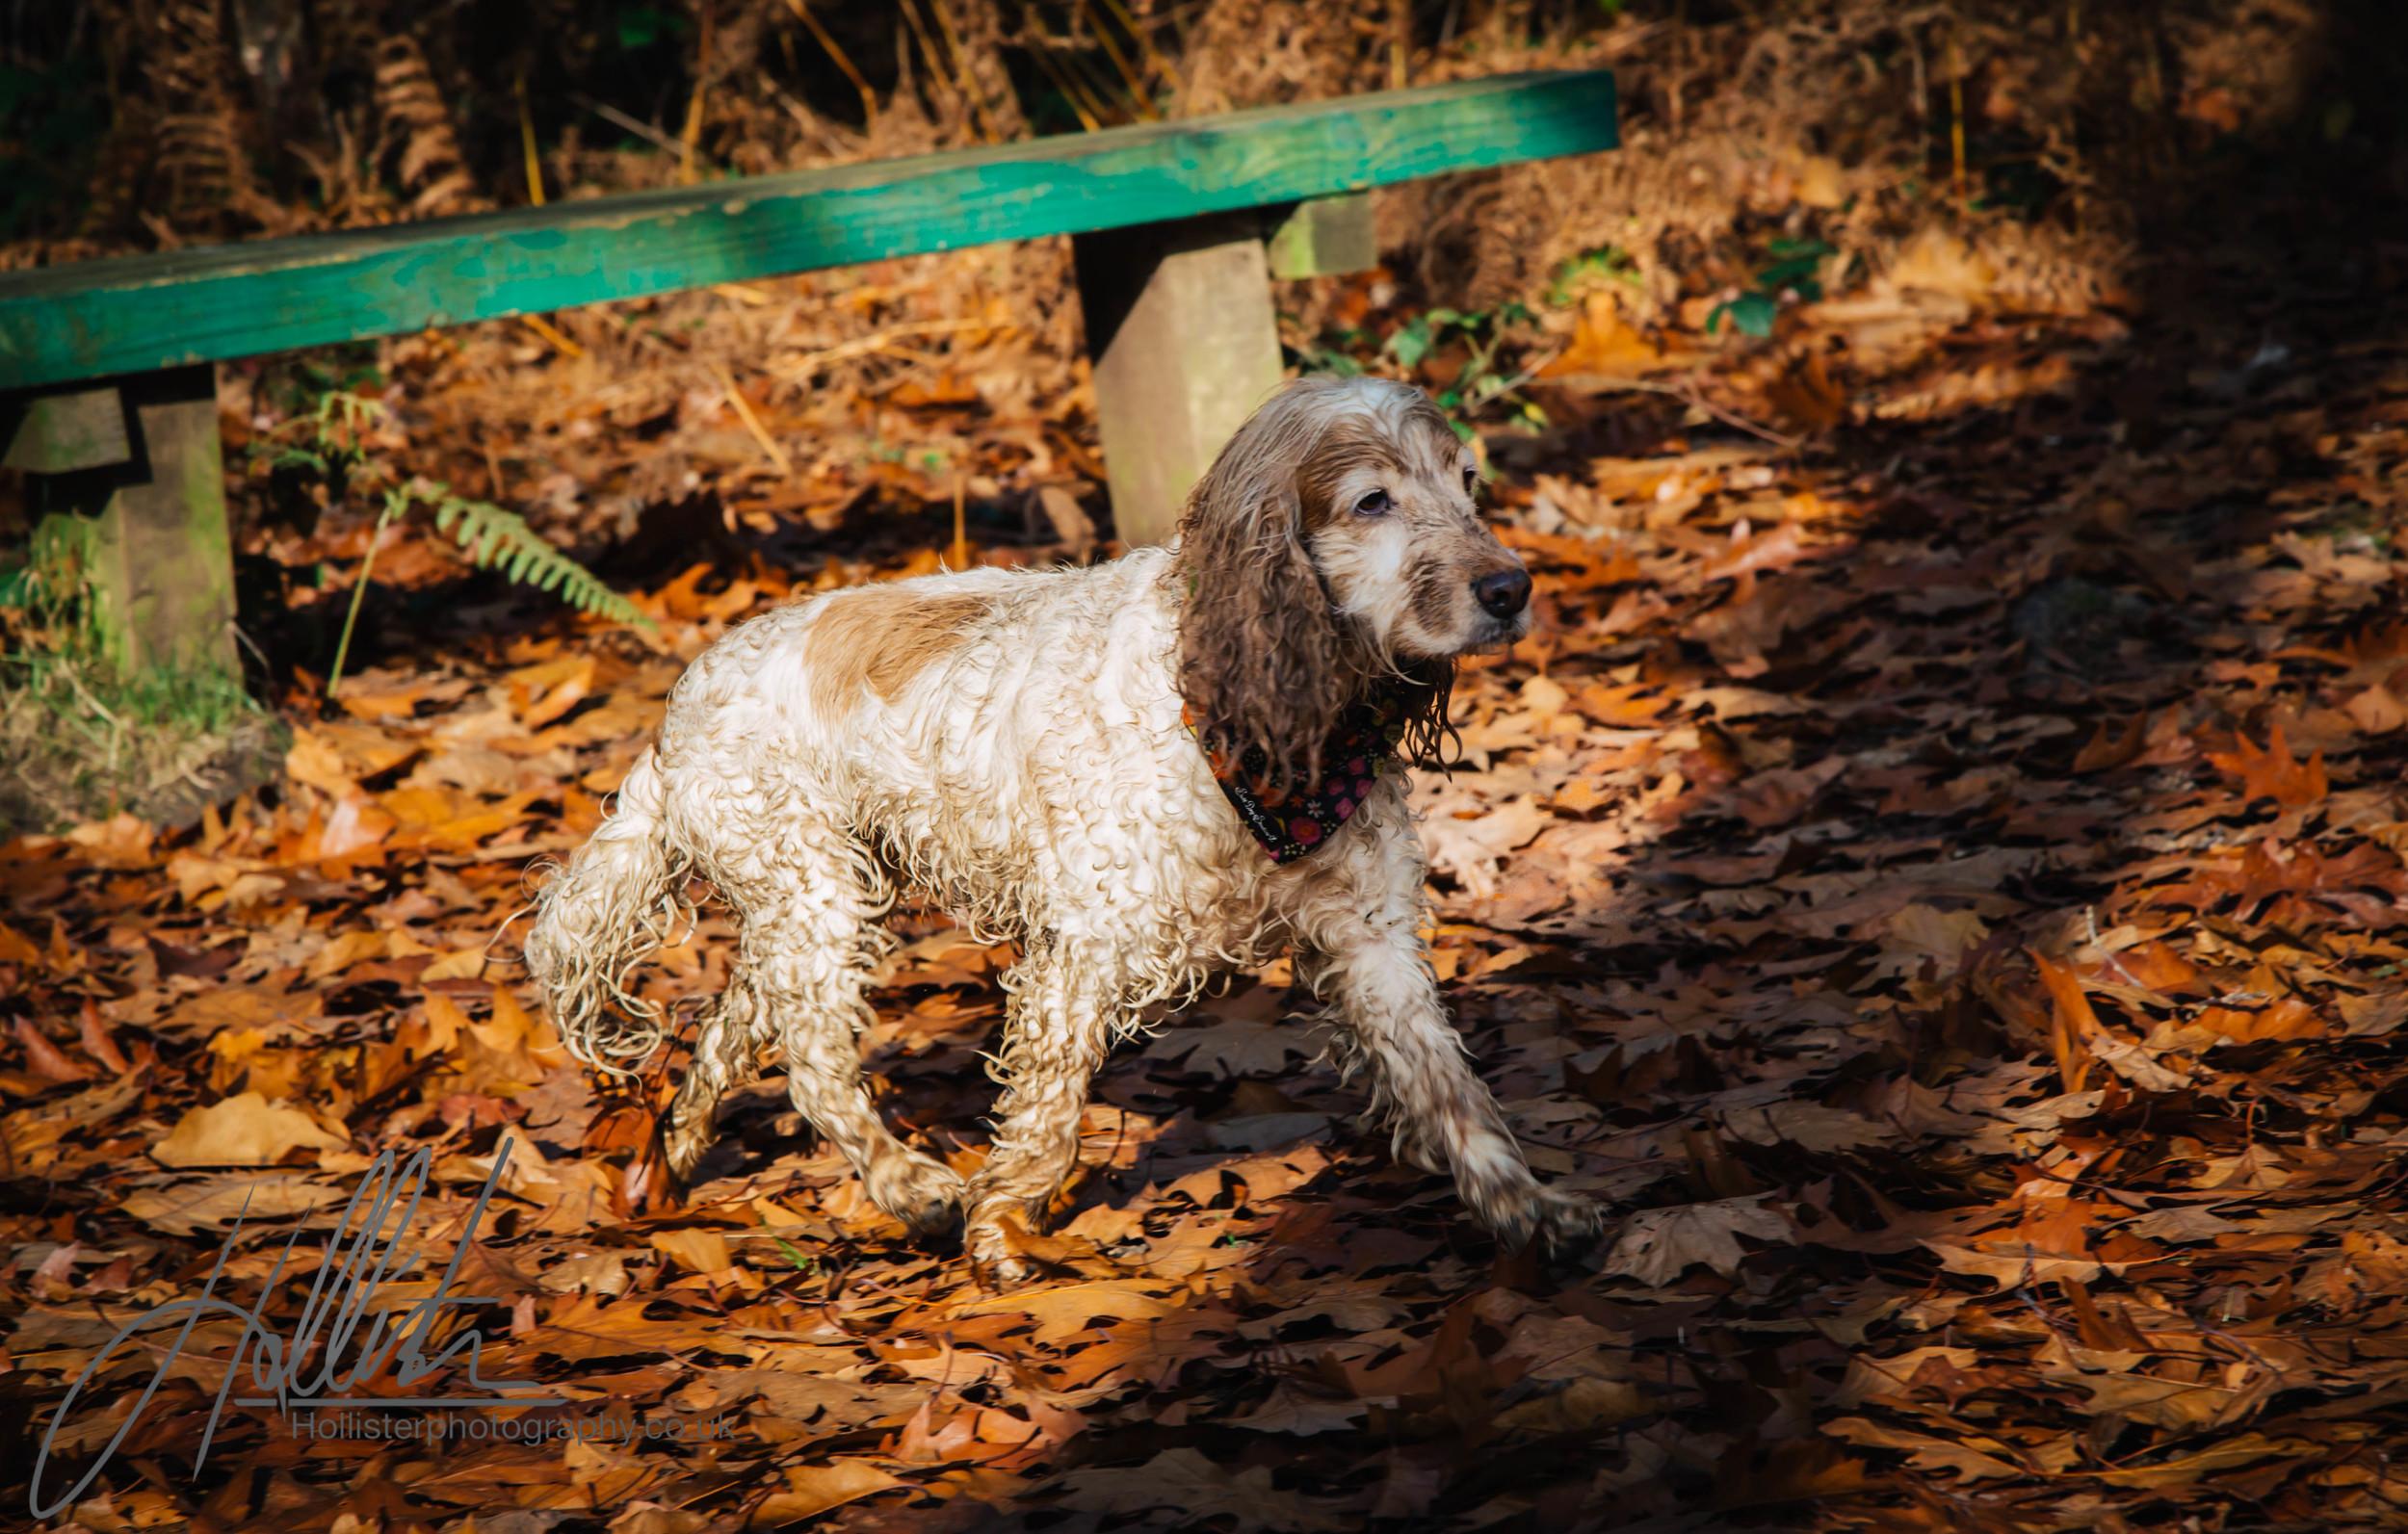 Hollisterphotography ABBY CLOWES WOOD DOG WALK-71.JPG